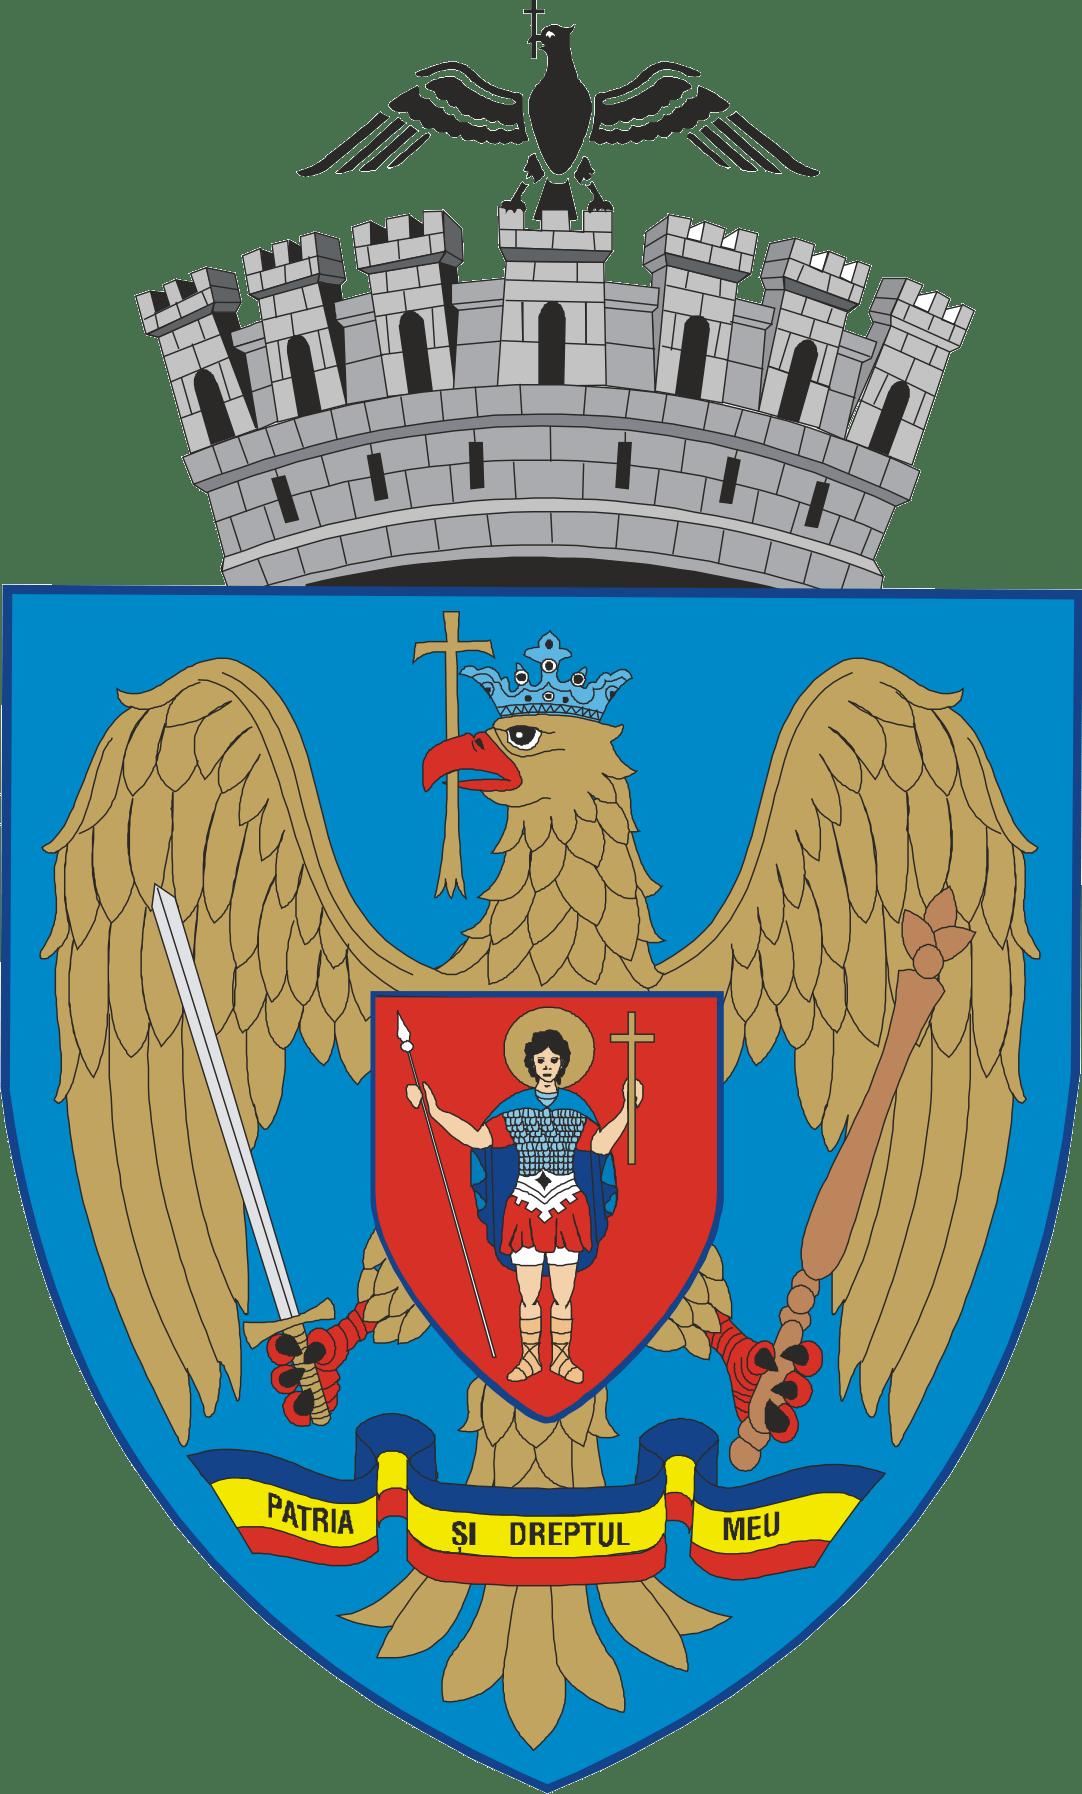 https://i1.wp.com/upload.wikimedia.org/wikipedia/commons/1/19/ROU_Bucharest_CoA.png